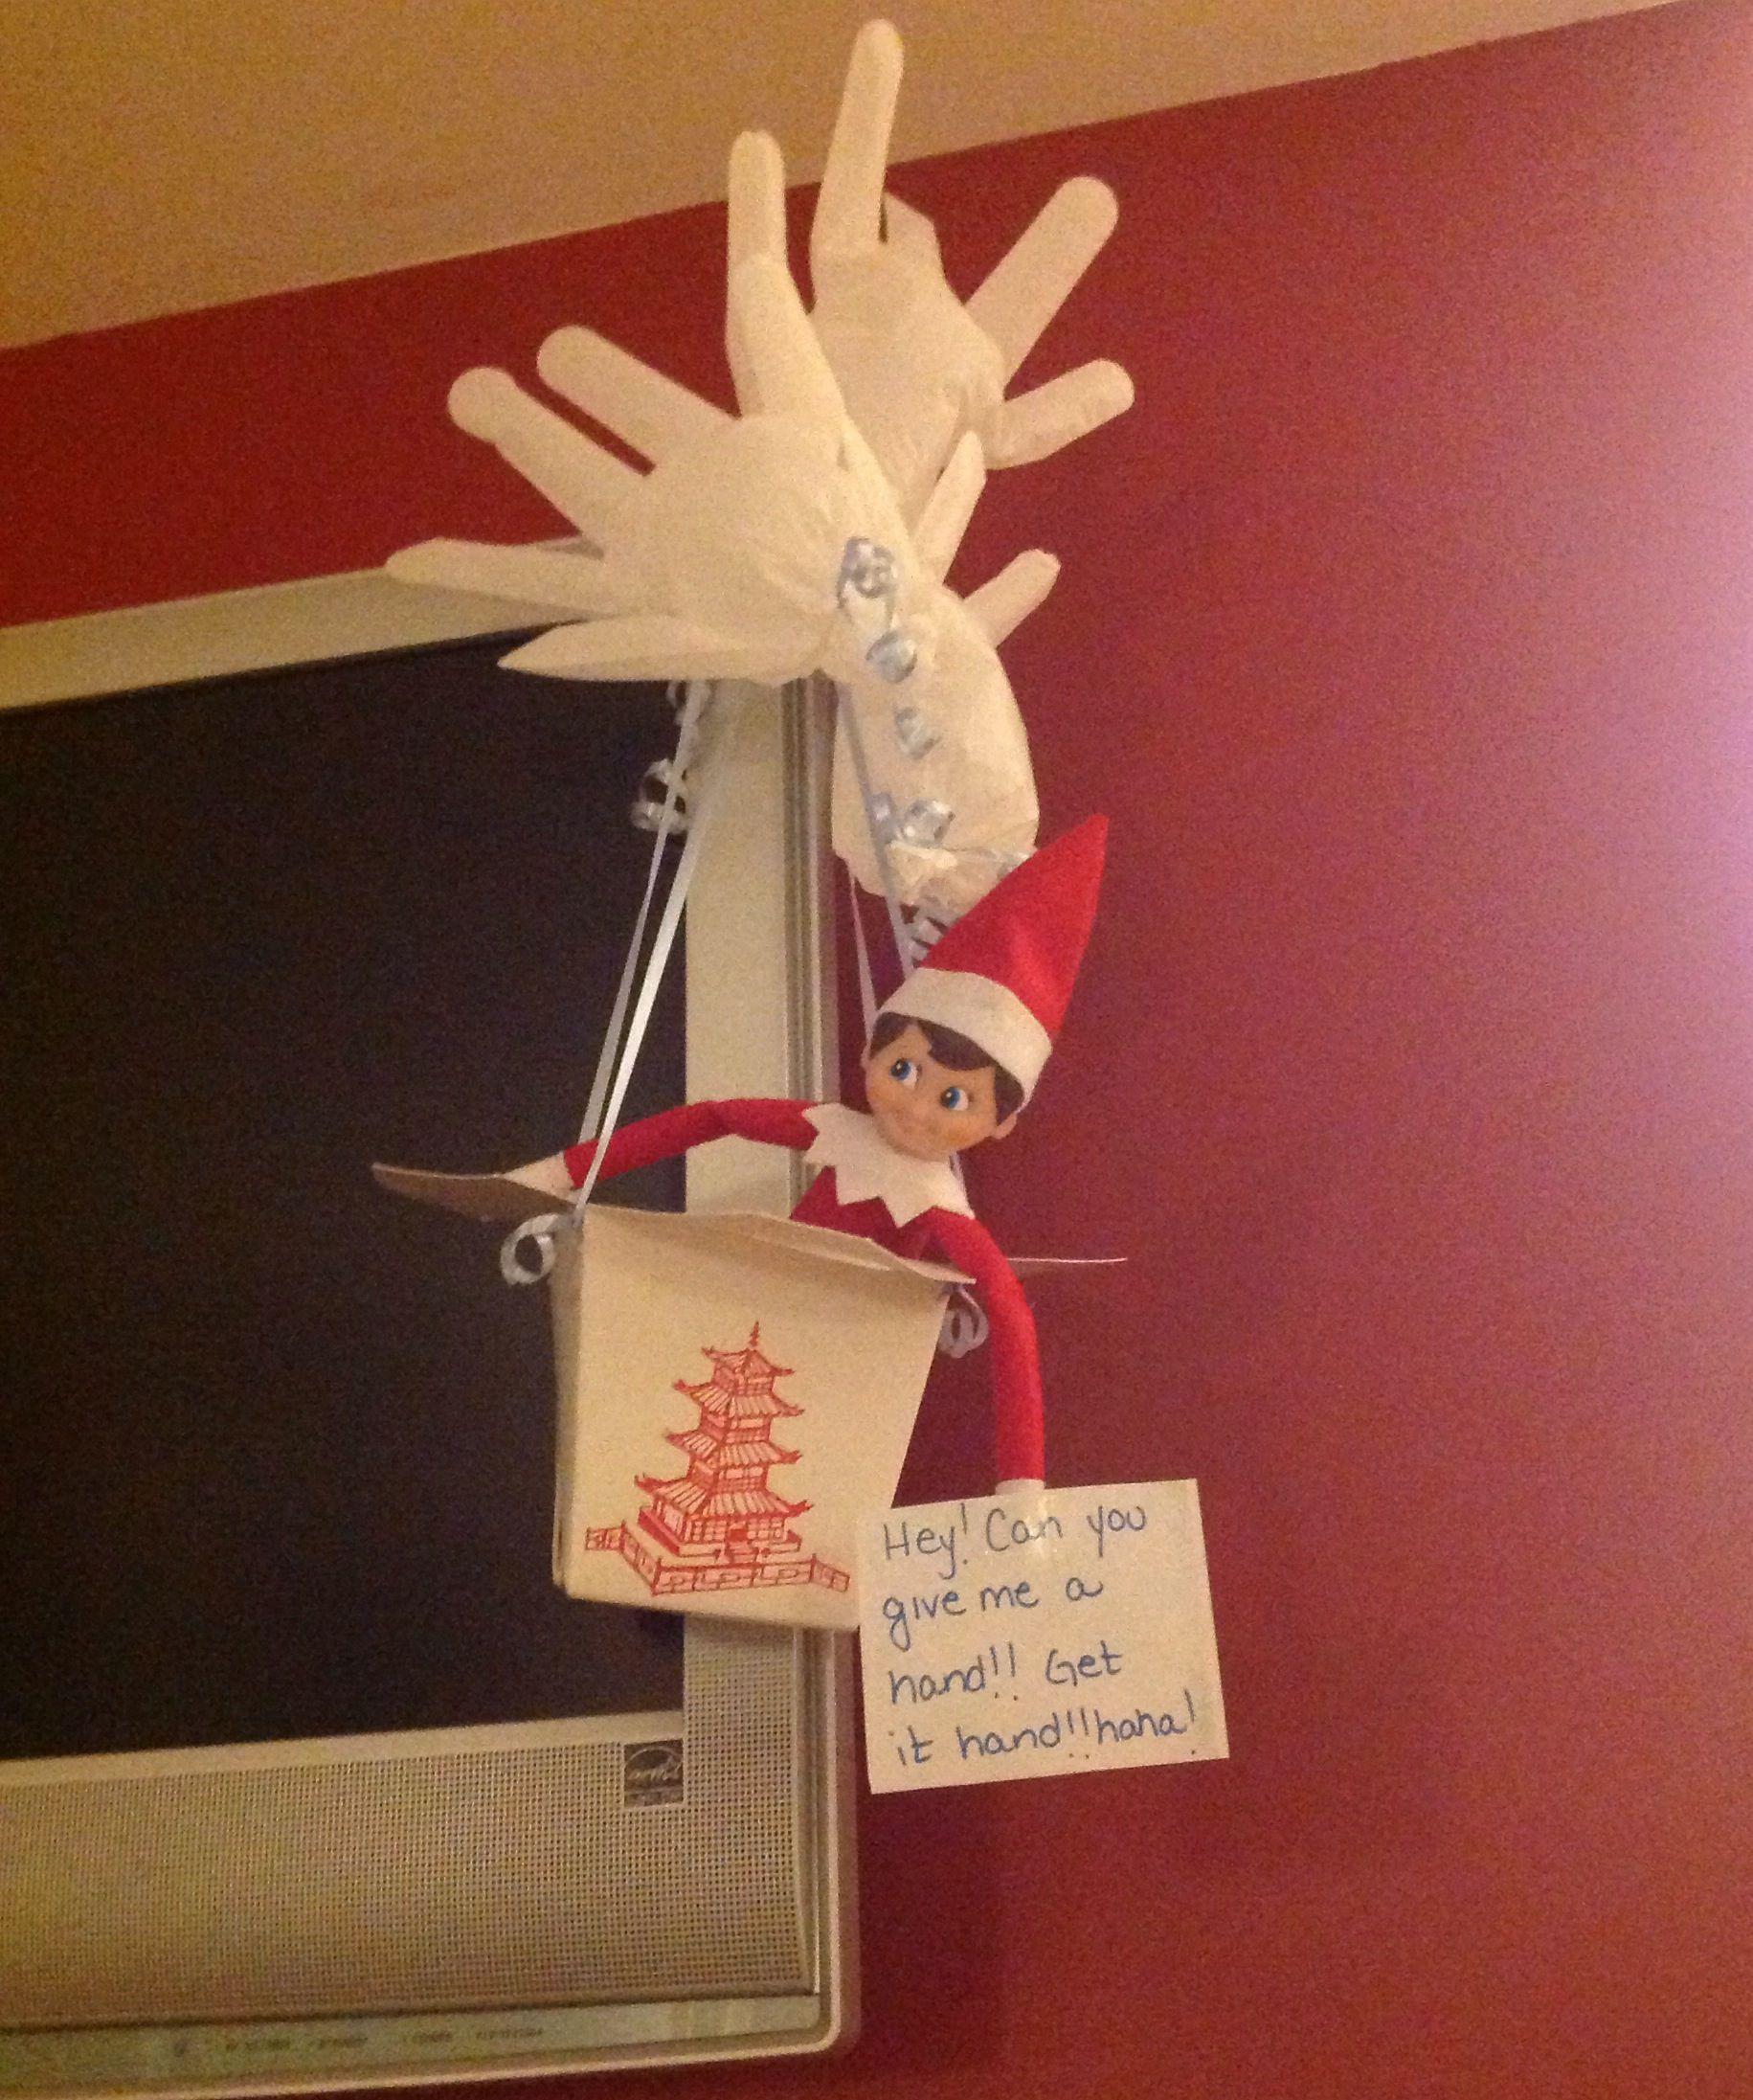 Elf on the shelfParachute accident Elf on the shelf